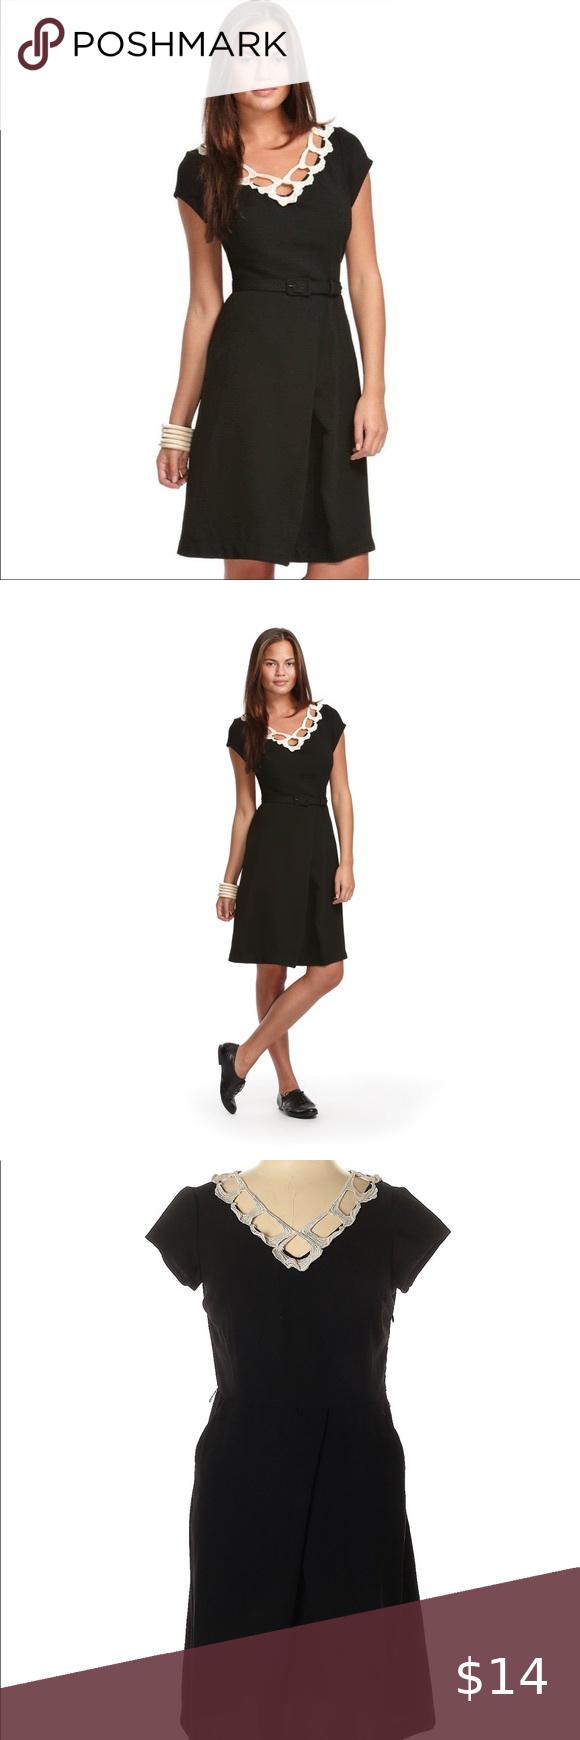 Libertine For Target Black Dress W White Lace Trim Black Dress Dresses Clothes Design [ 1740 x 580 Pixel ]